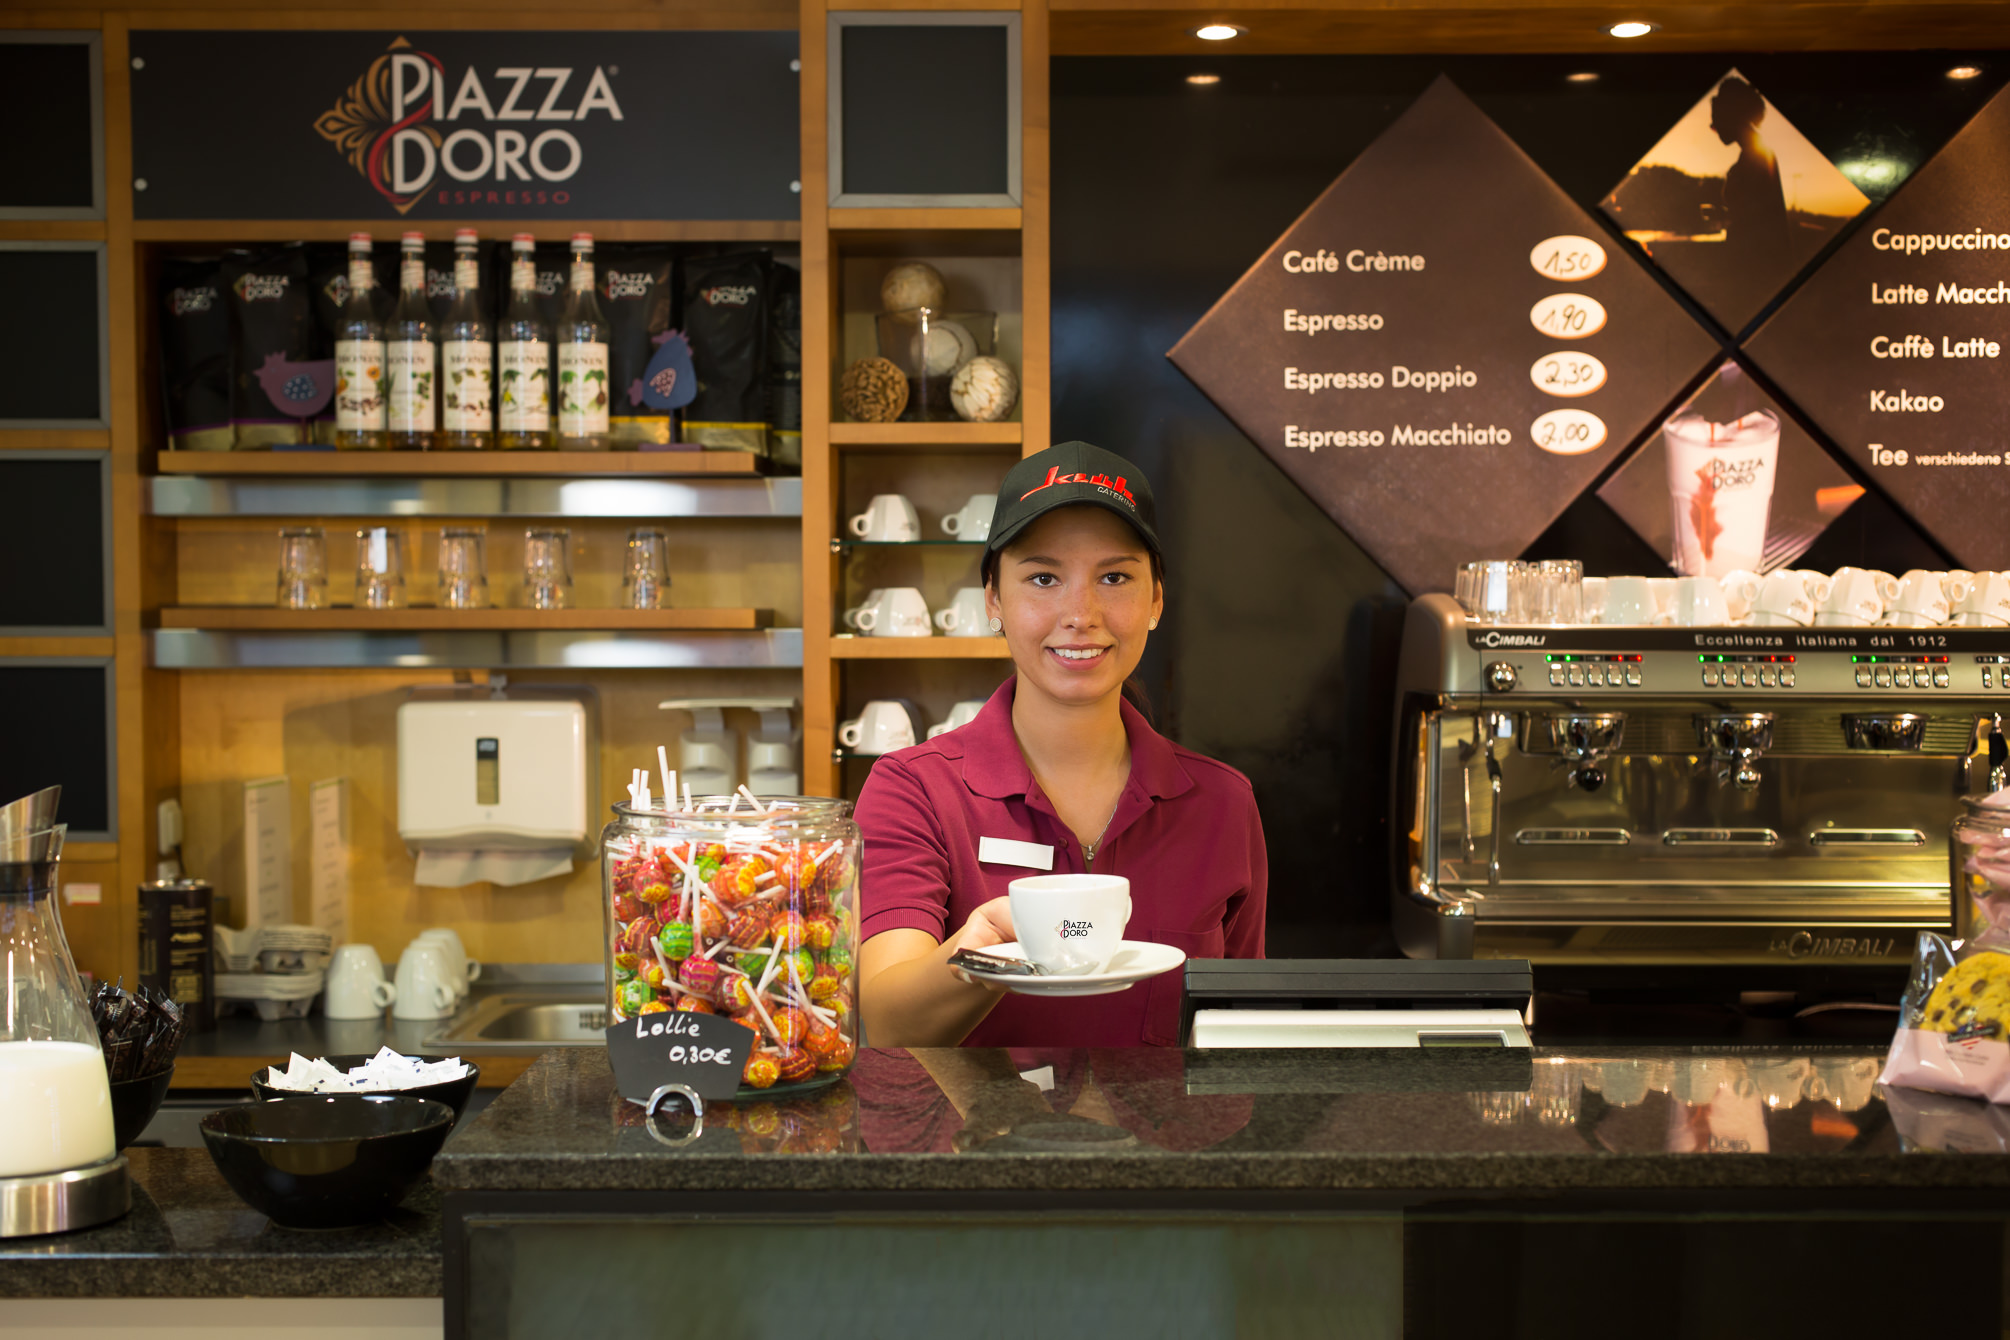 Kaffee, Kaffeebar, Siebträgermaschine, Kantine, Cafeteria, Latte Macchiato, Cappuccino, Aroma, Claudia Zurlo Photography